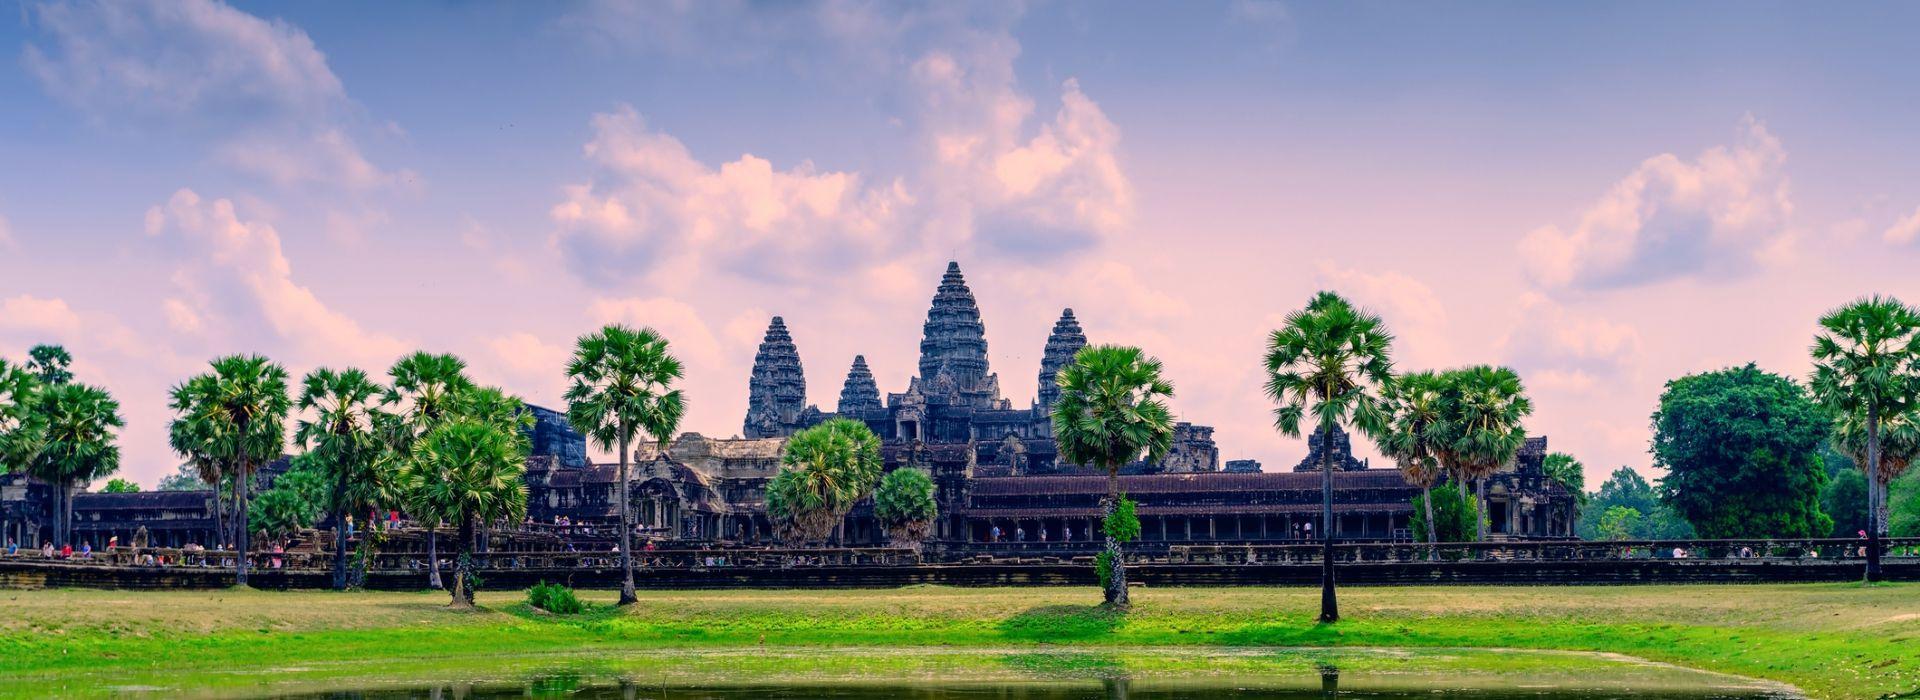 Zip lining Tours in Siem Reap